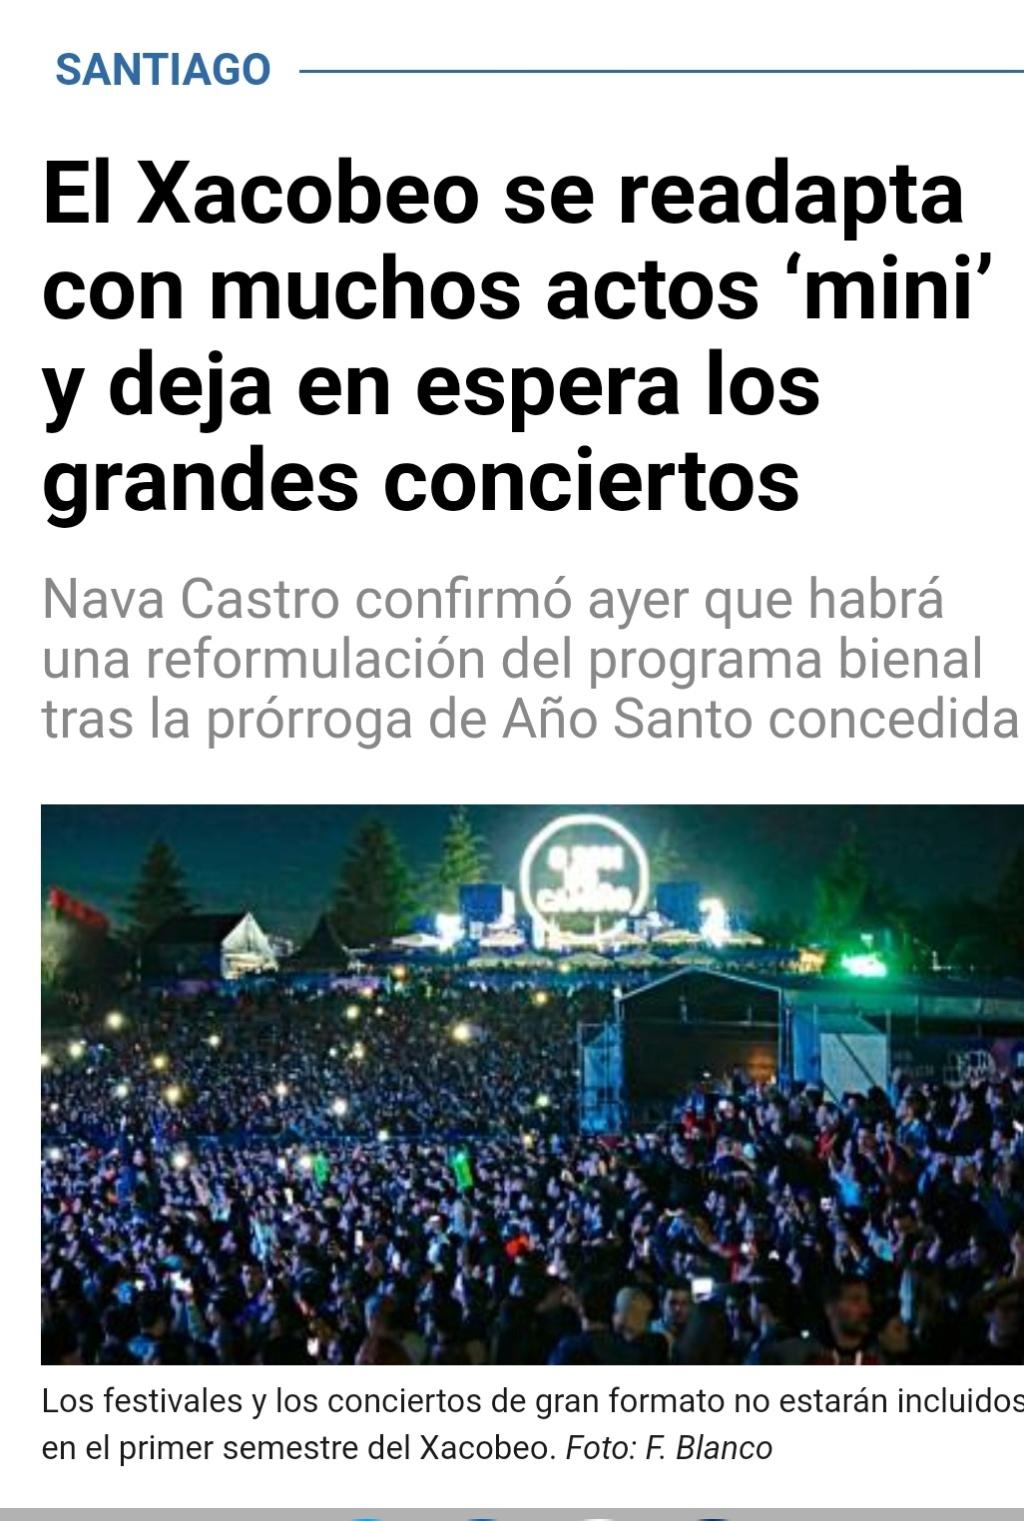 Resurrection Fest Estrella Galicia 2021. (2 - 5 Junio) System of a Down, Deftones, KoRn - Página 5 Img_2022